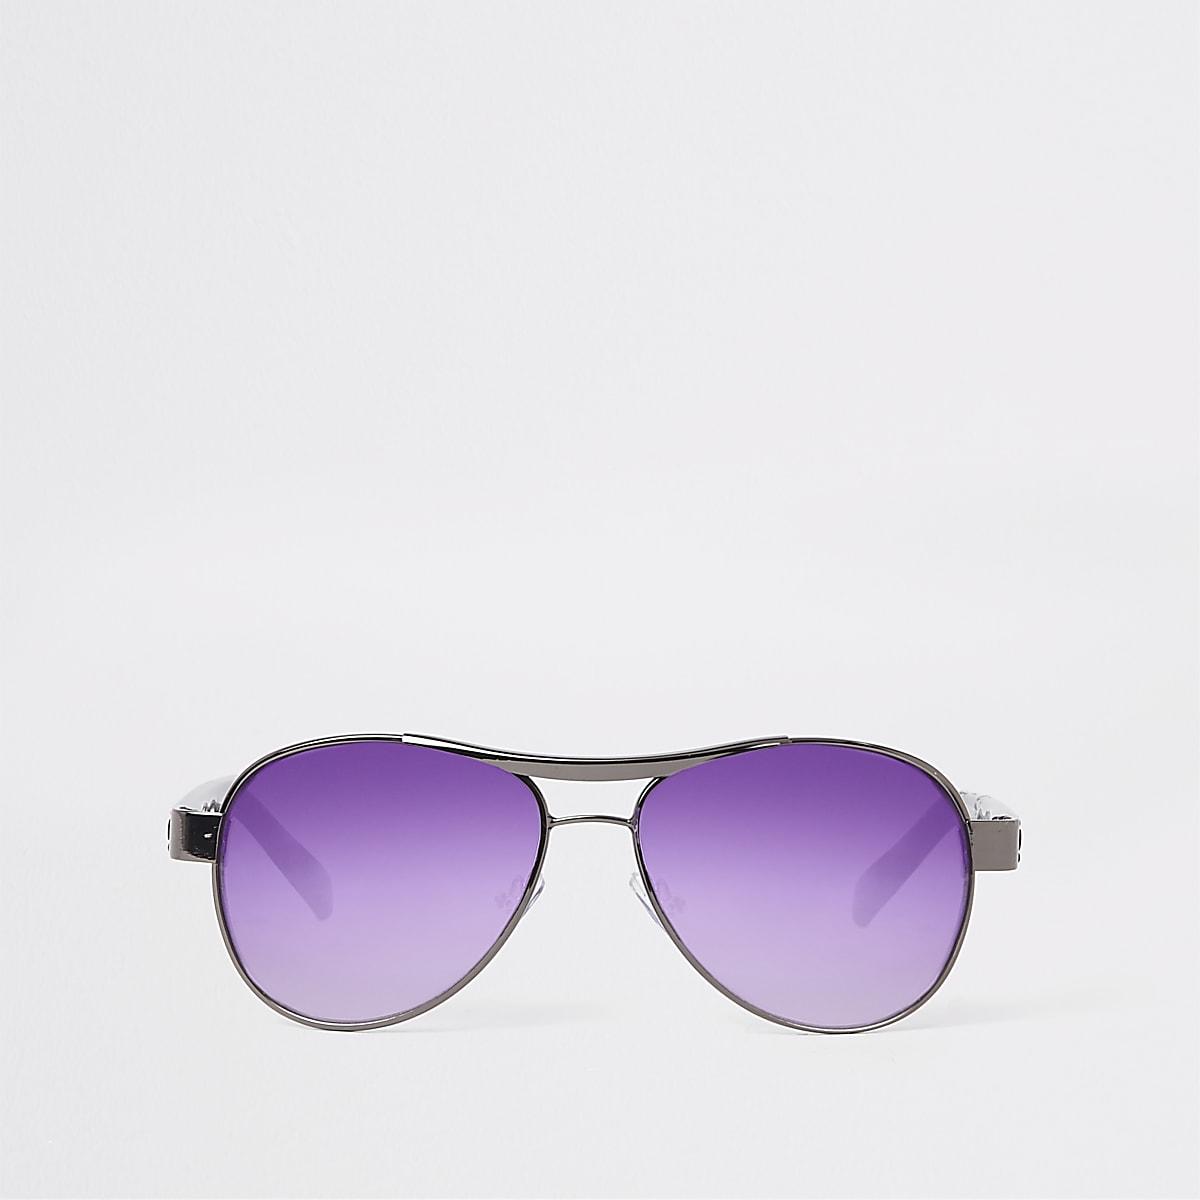 f19879346336 Boys grey aviator purple lens sunglasses - Sunglasses - Accessories - boys